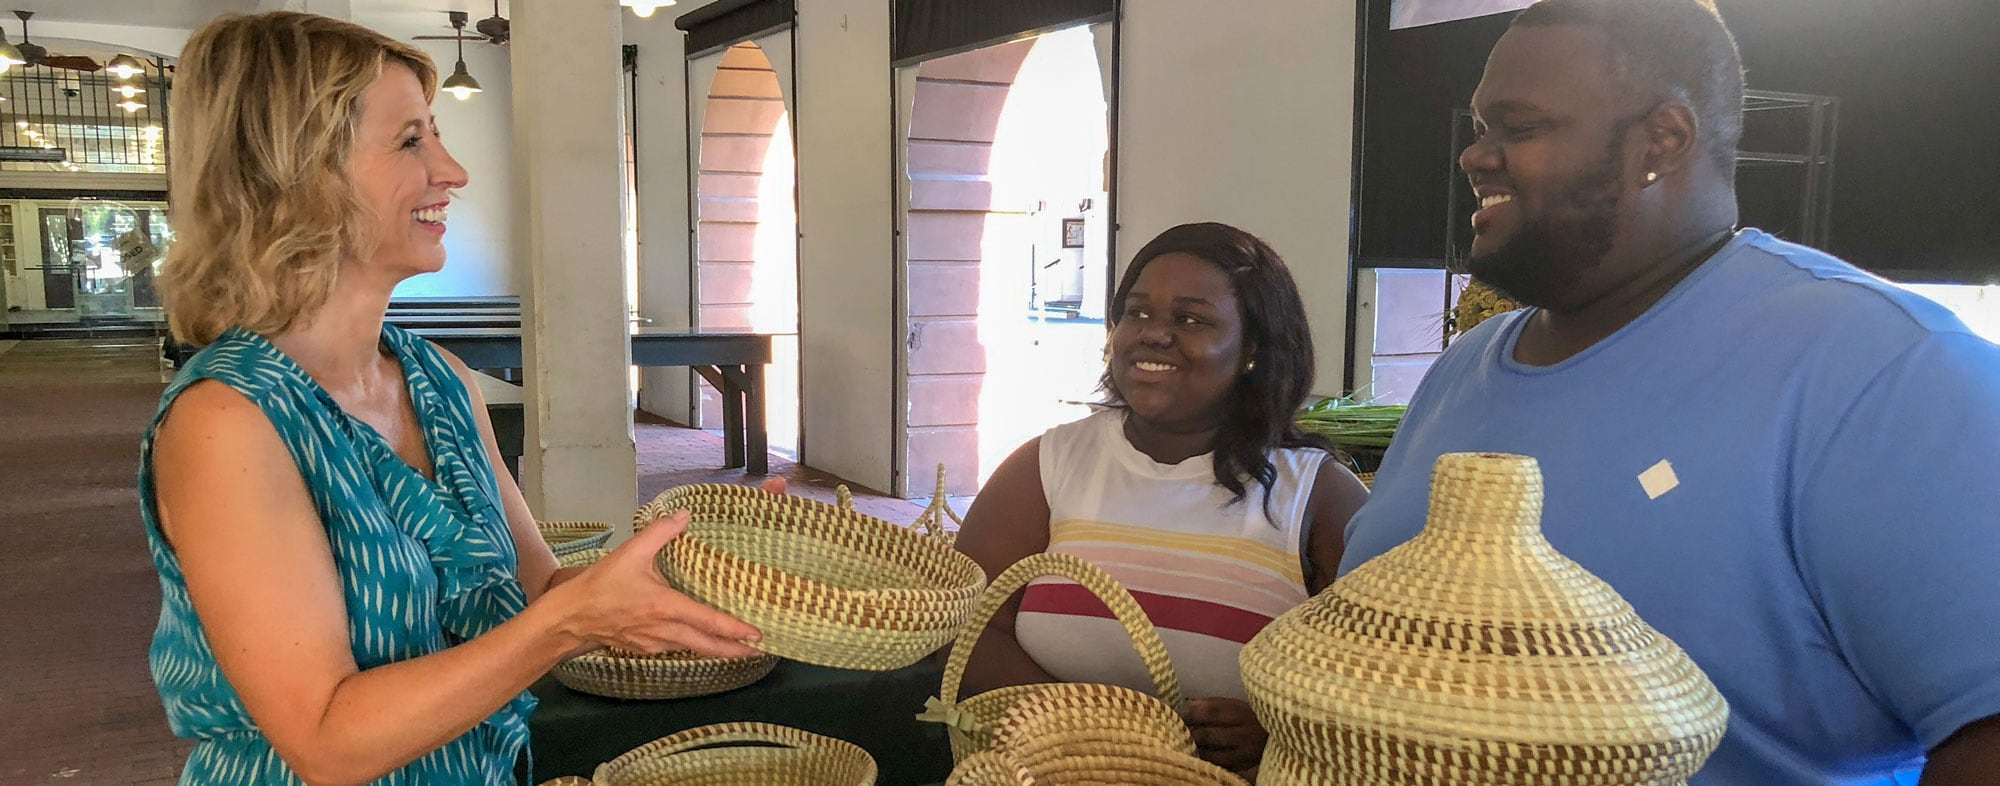 Charleston Places To Love - Samantha Brown